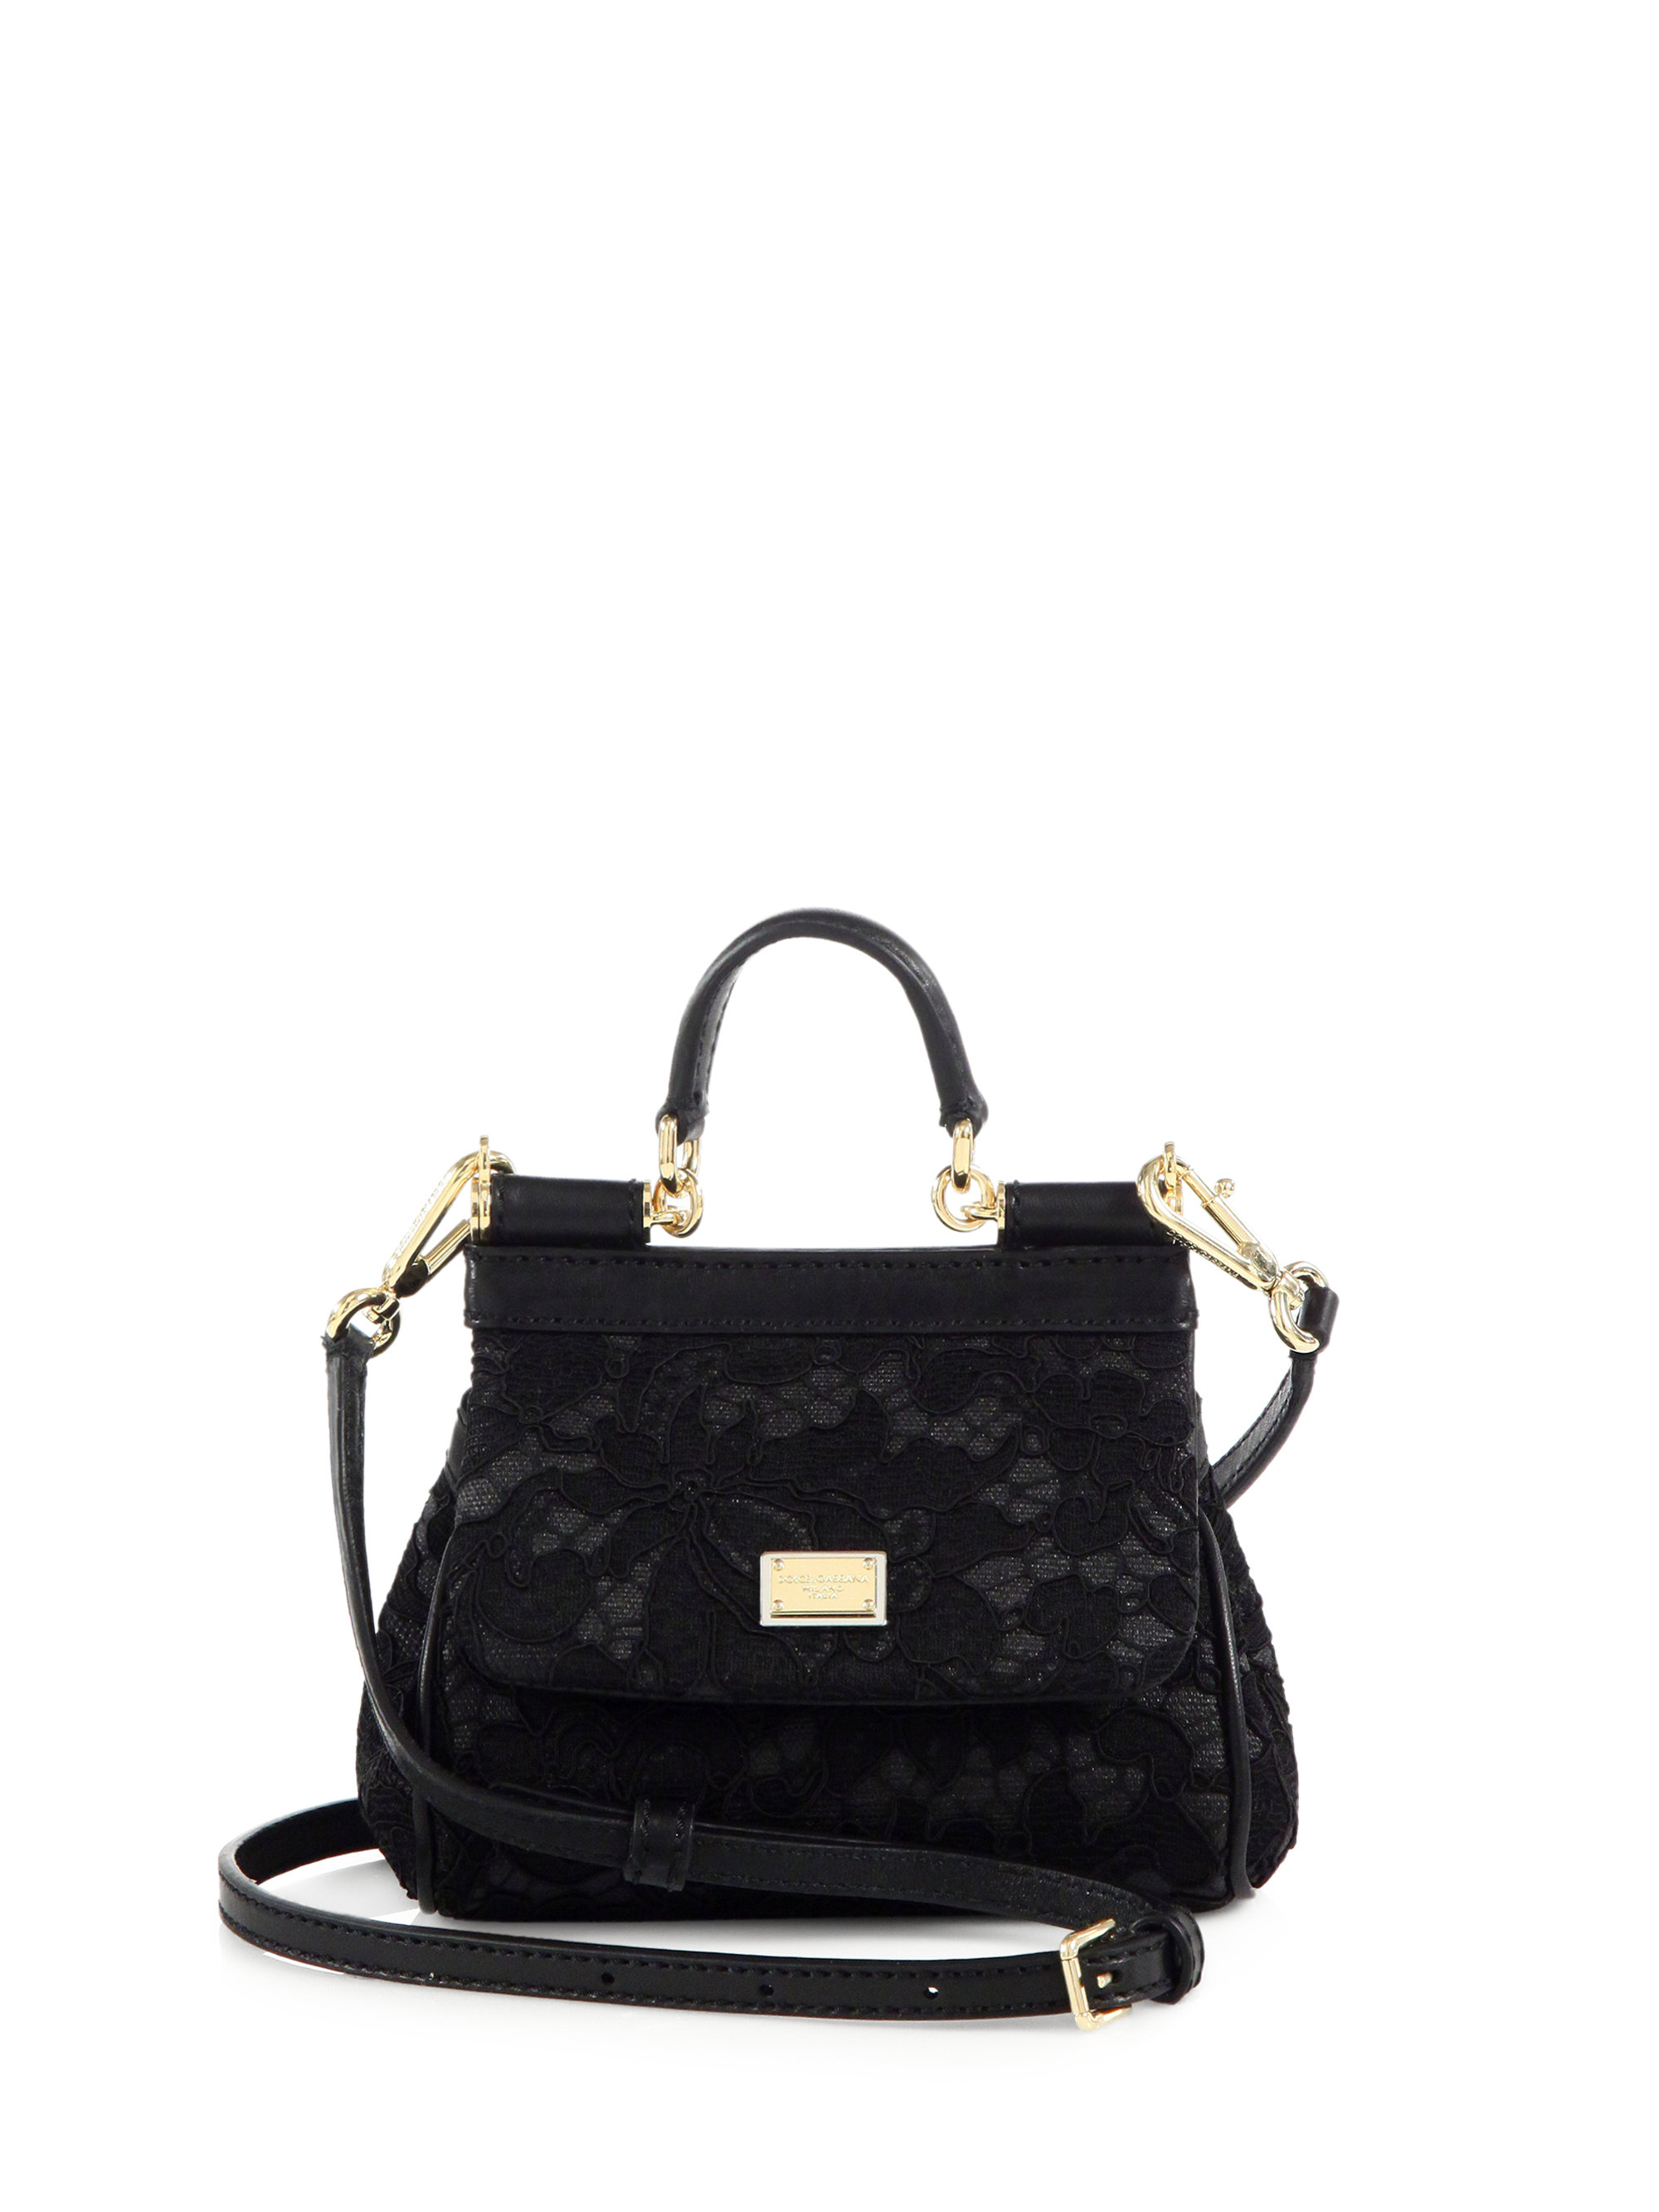 025c14a7f4cf Lyst - Dolce   Gabbana Miss Sicily Lace Mini Crossbody Bag in Black